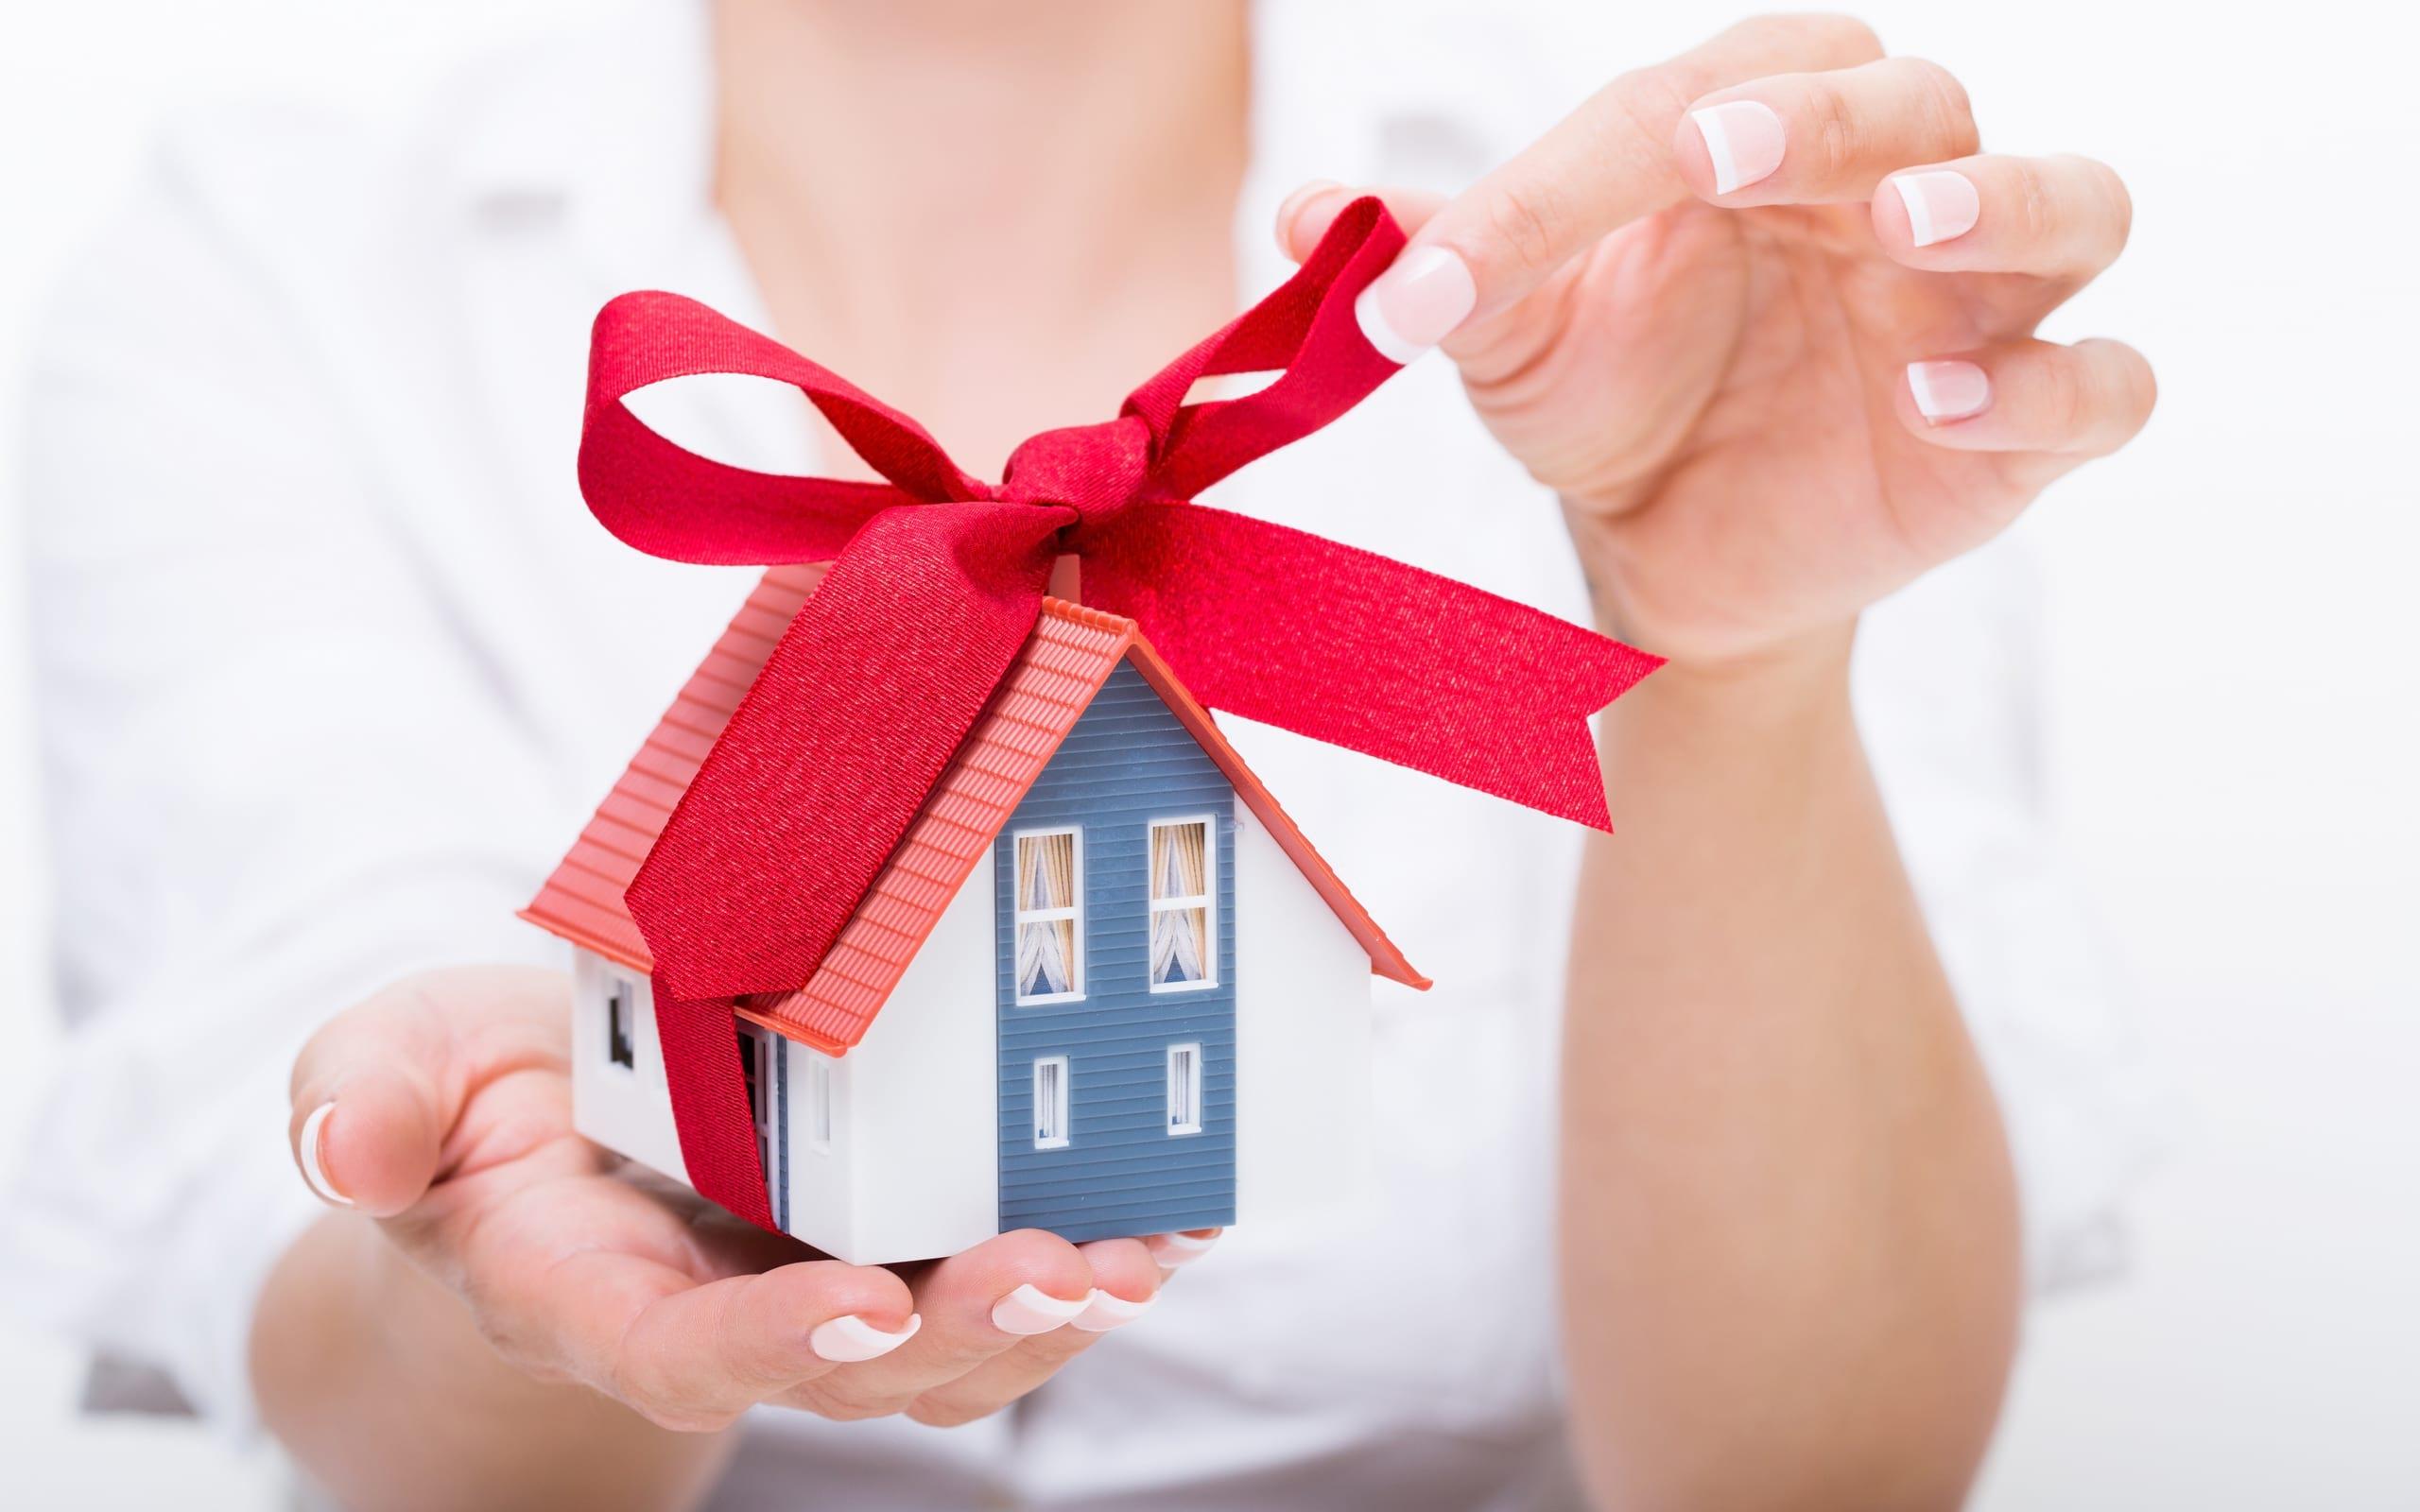 делится ли дарственная квартира при разводе